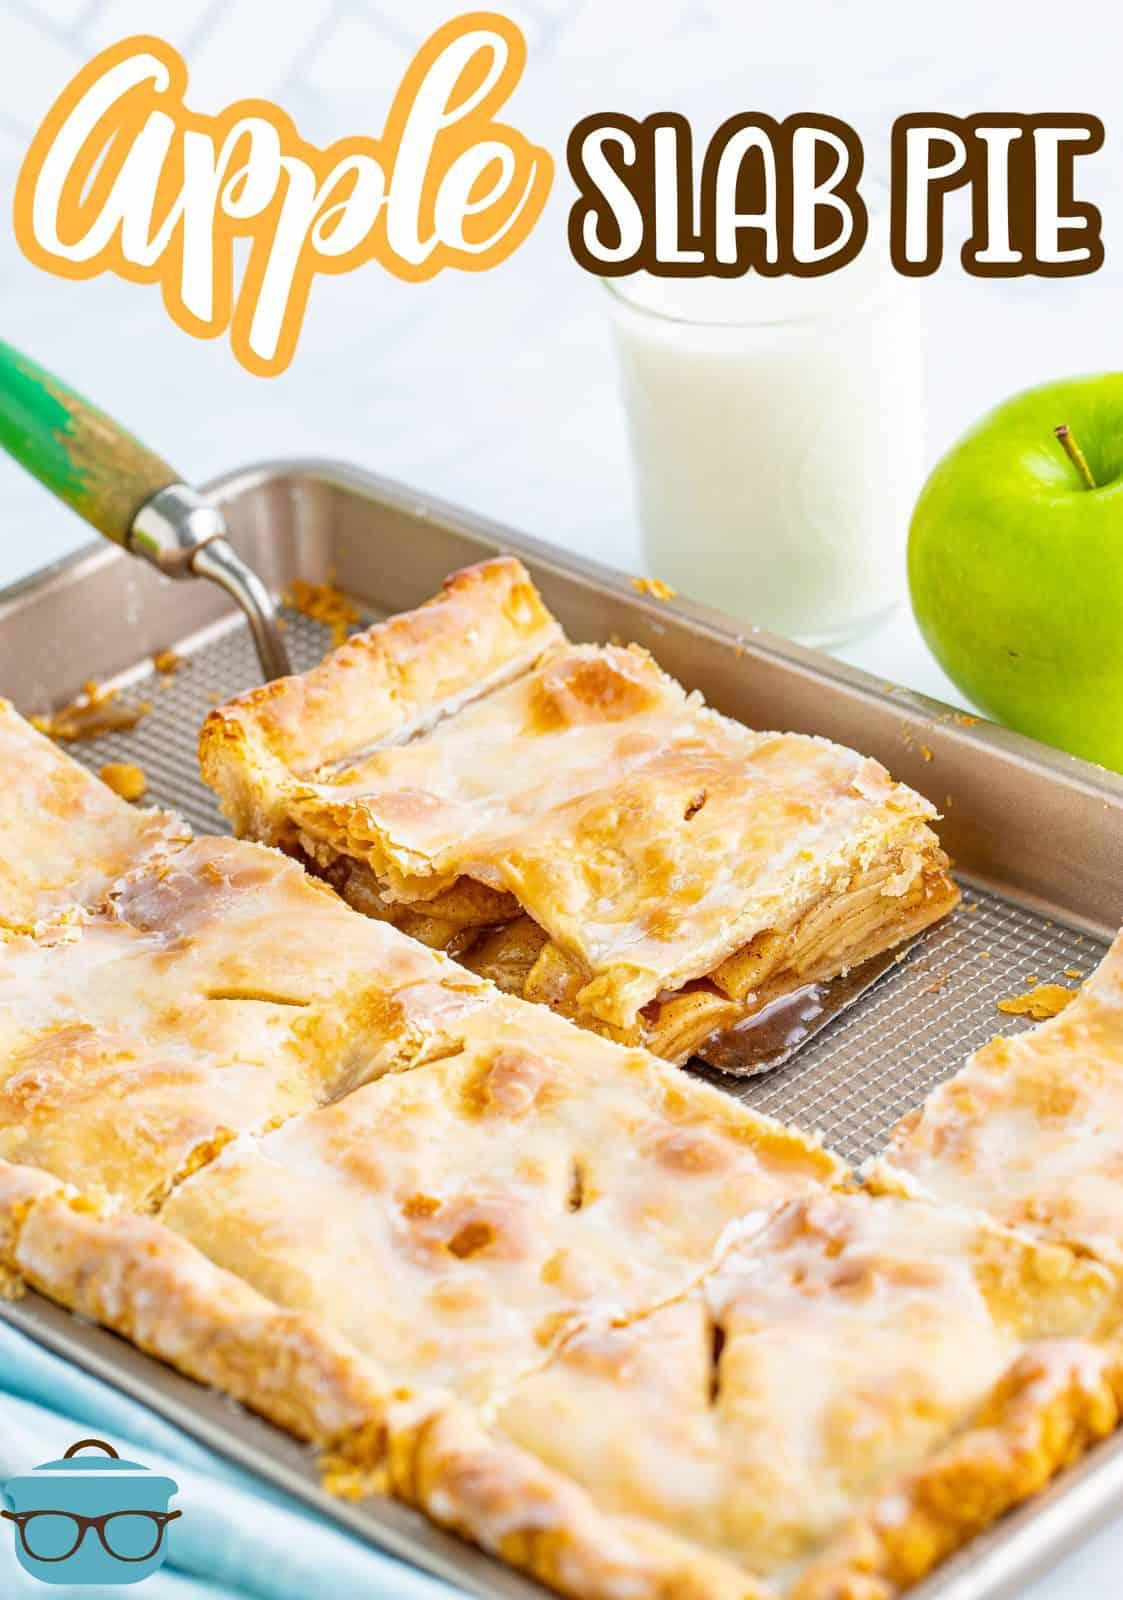 Pinterest image of a slice of Apple Slab Pie Recipe on server.